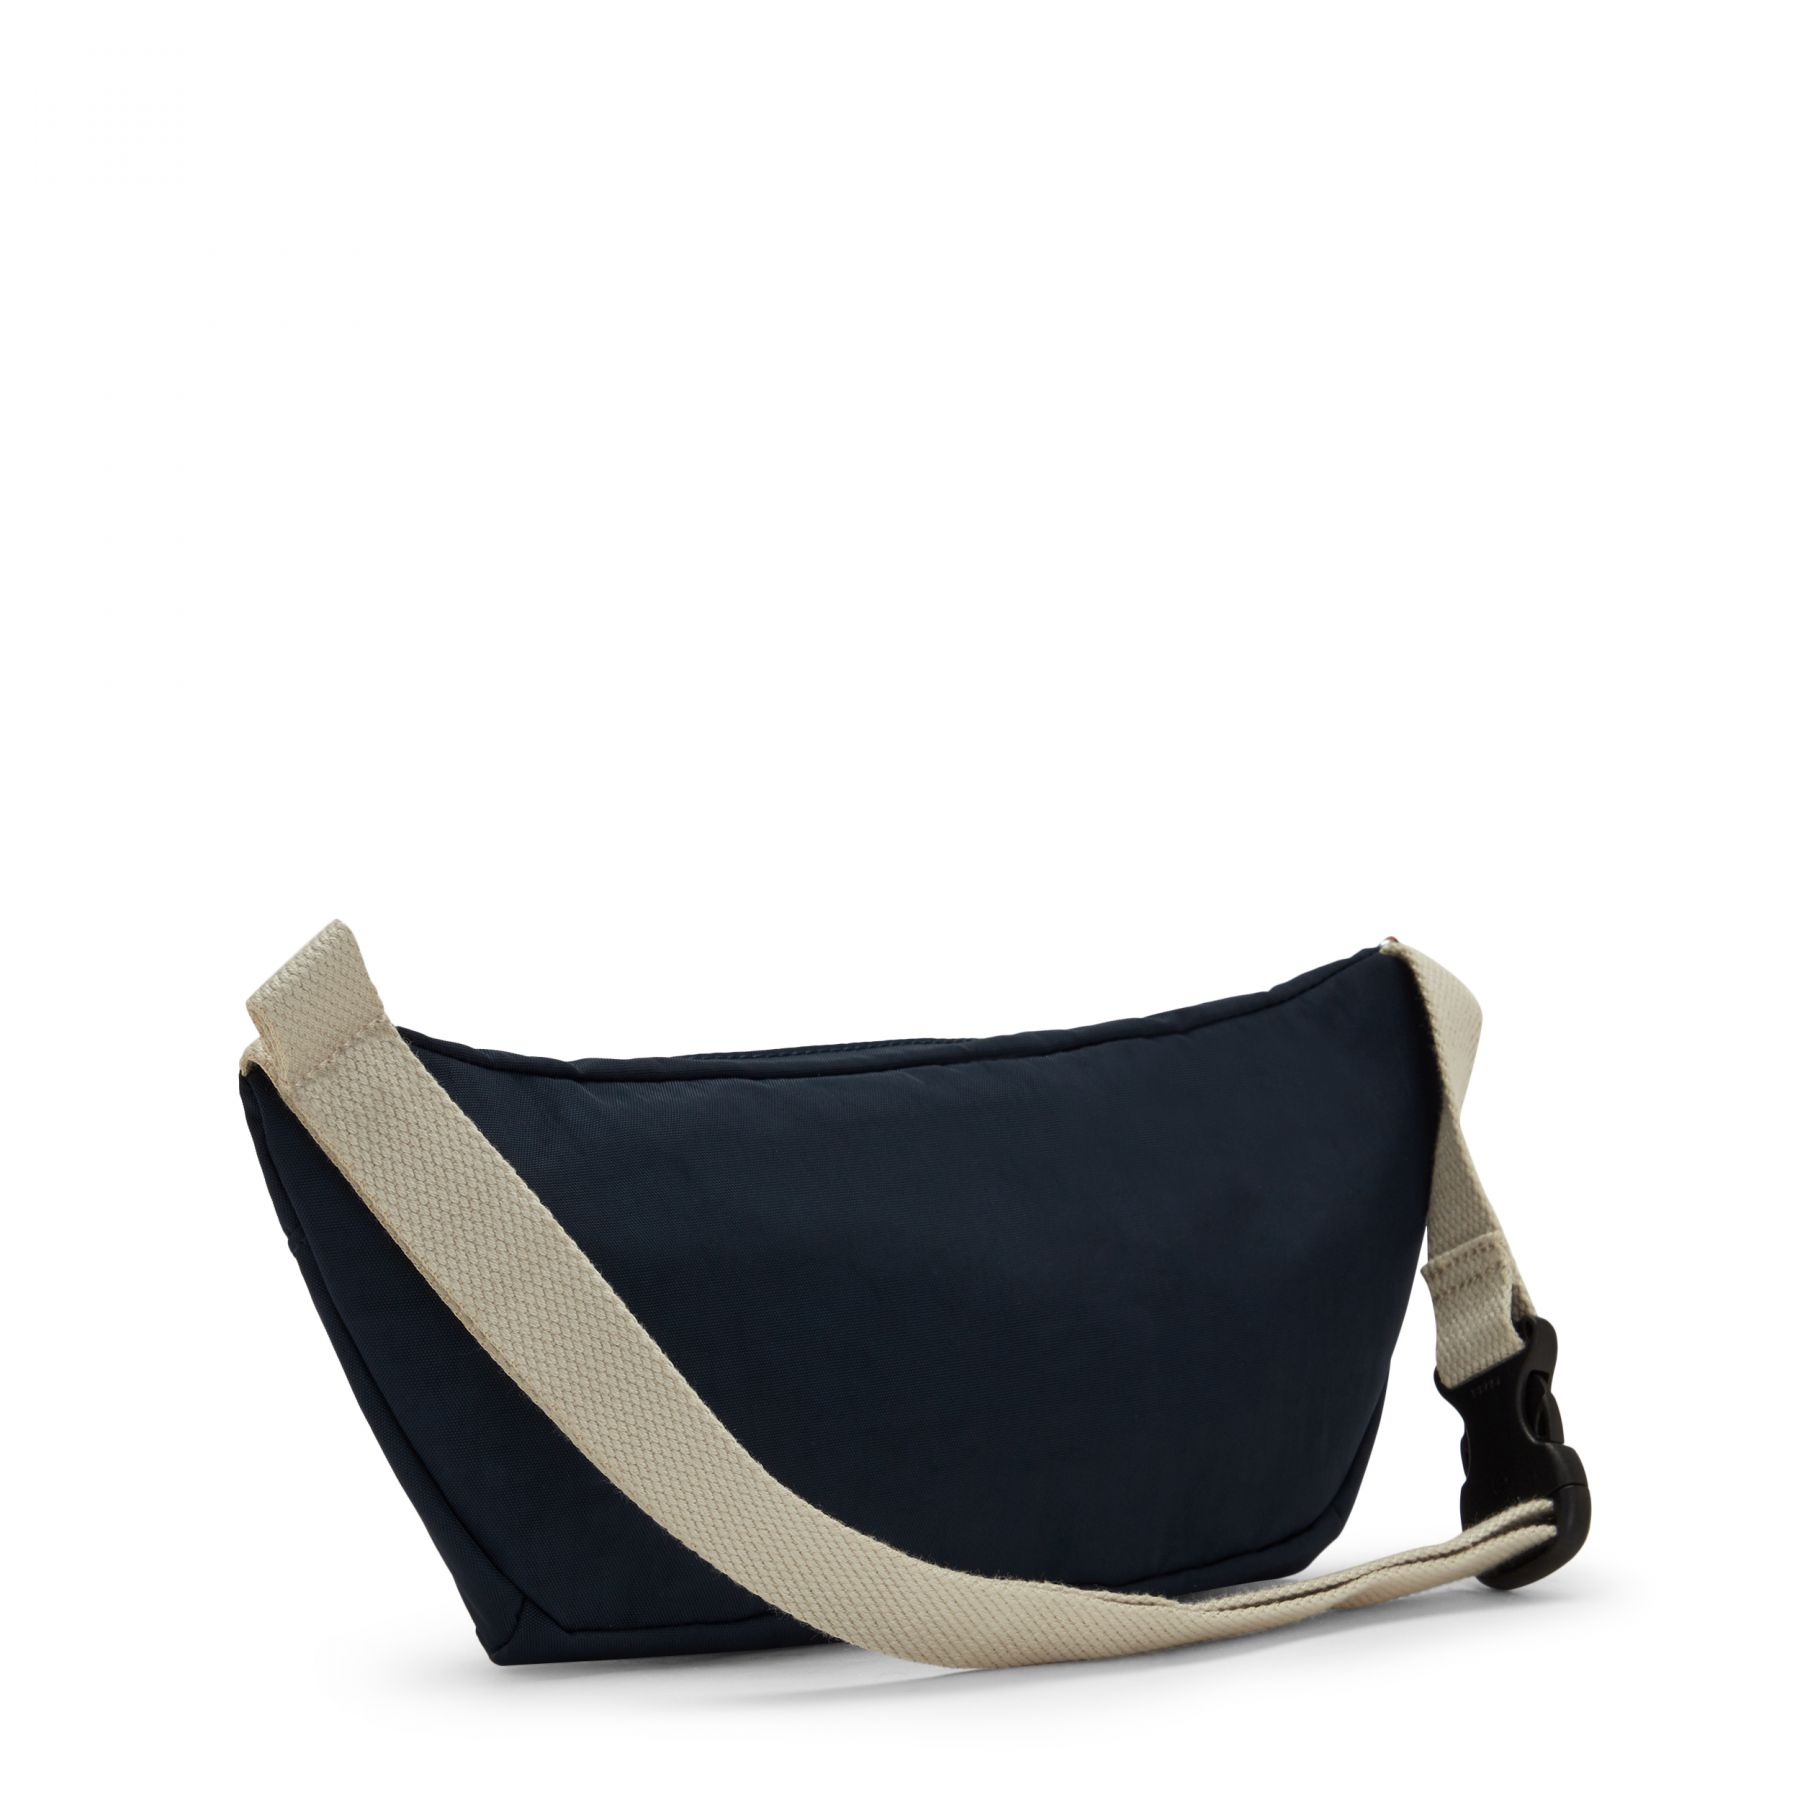 YURA BAGS by Kipling - Back view